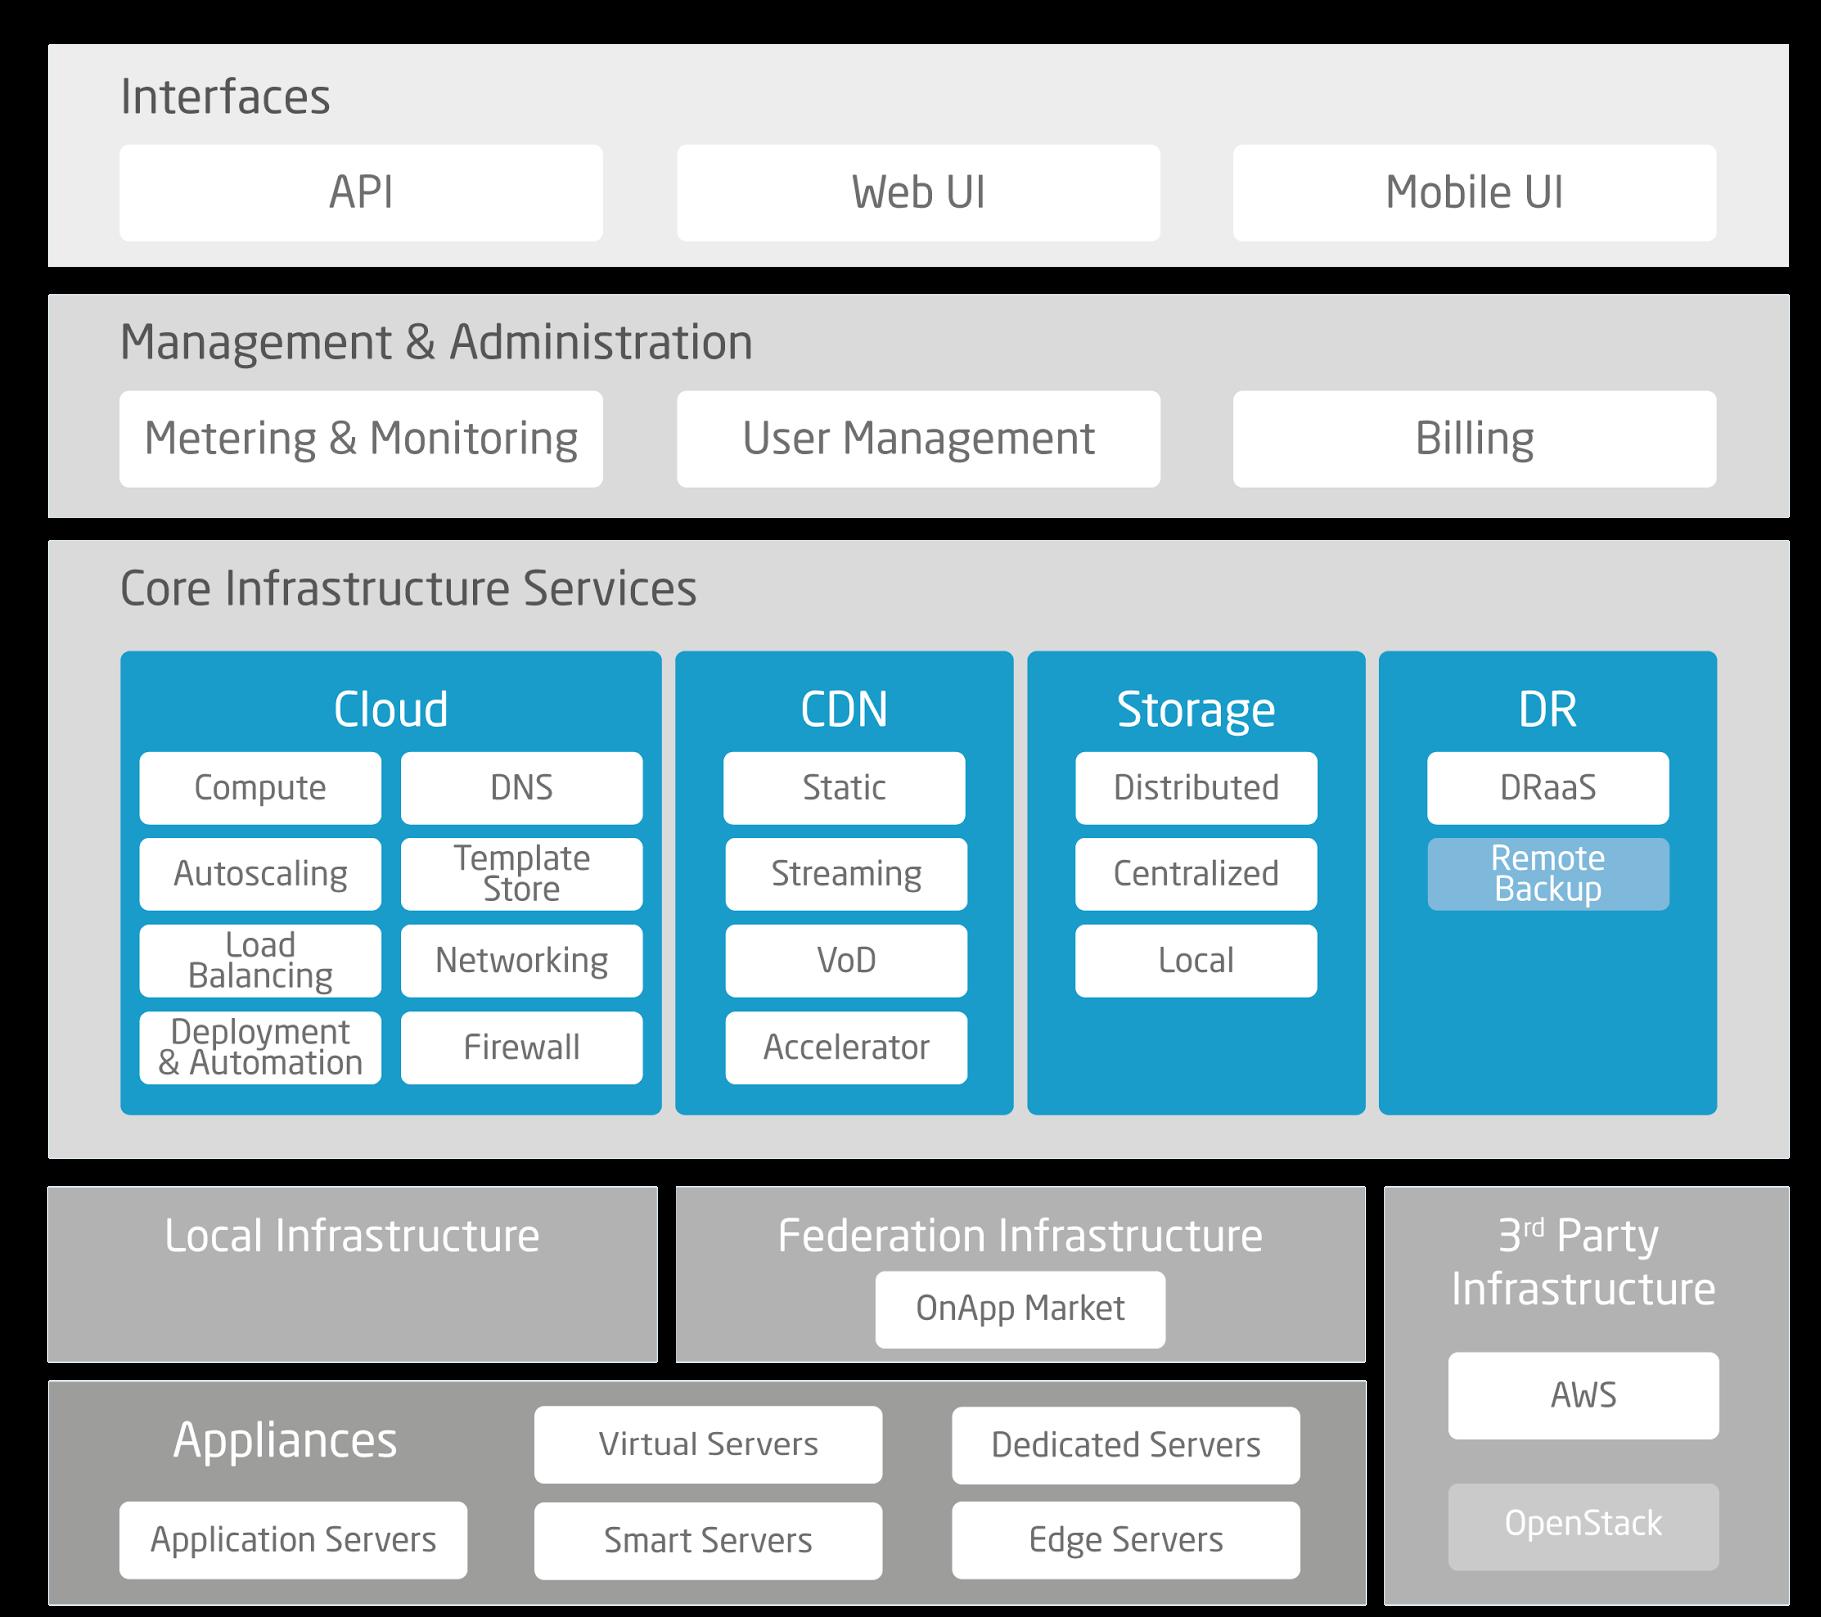 OnApp platform overview